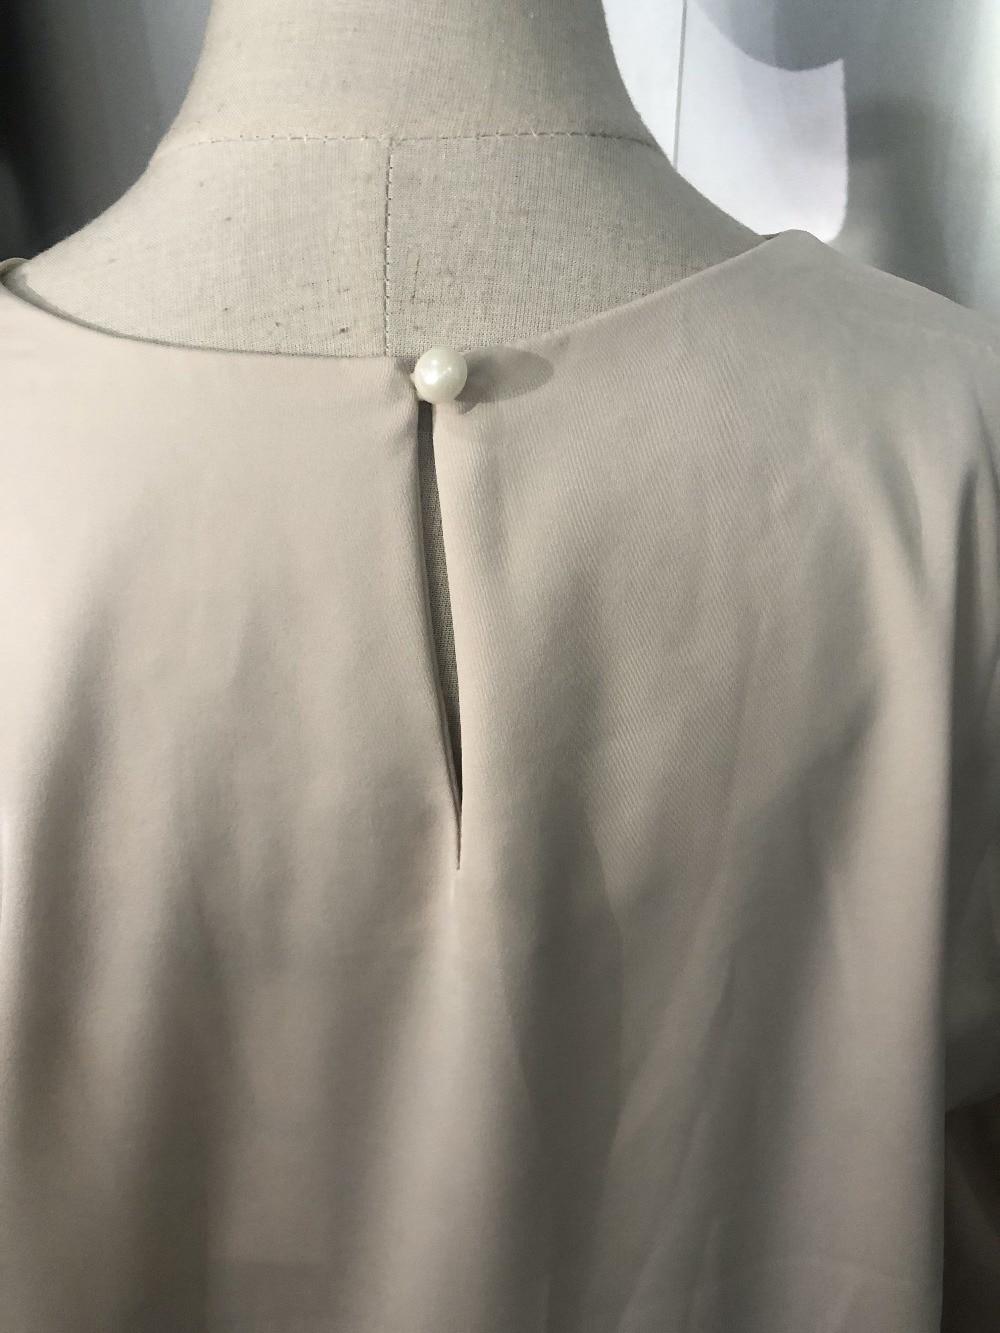 Hb848f6bb3297432fa89dbb140fe0cbb0r - Spring / Autumn O-Neck Long Puff Sleeves Two-Button Cuffs Loose Solid Blouse